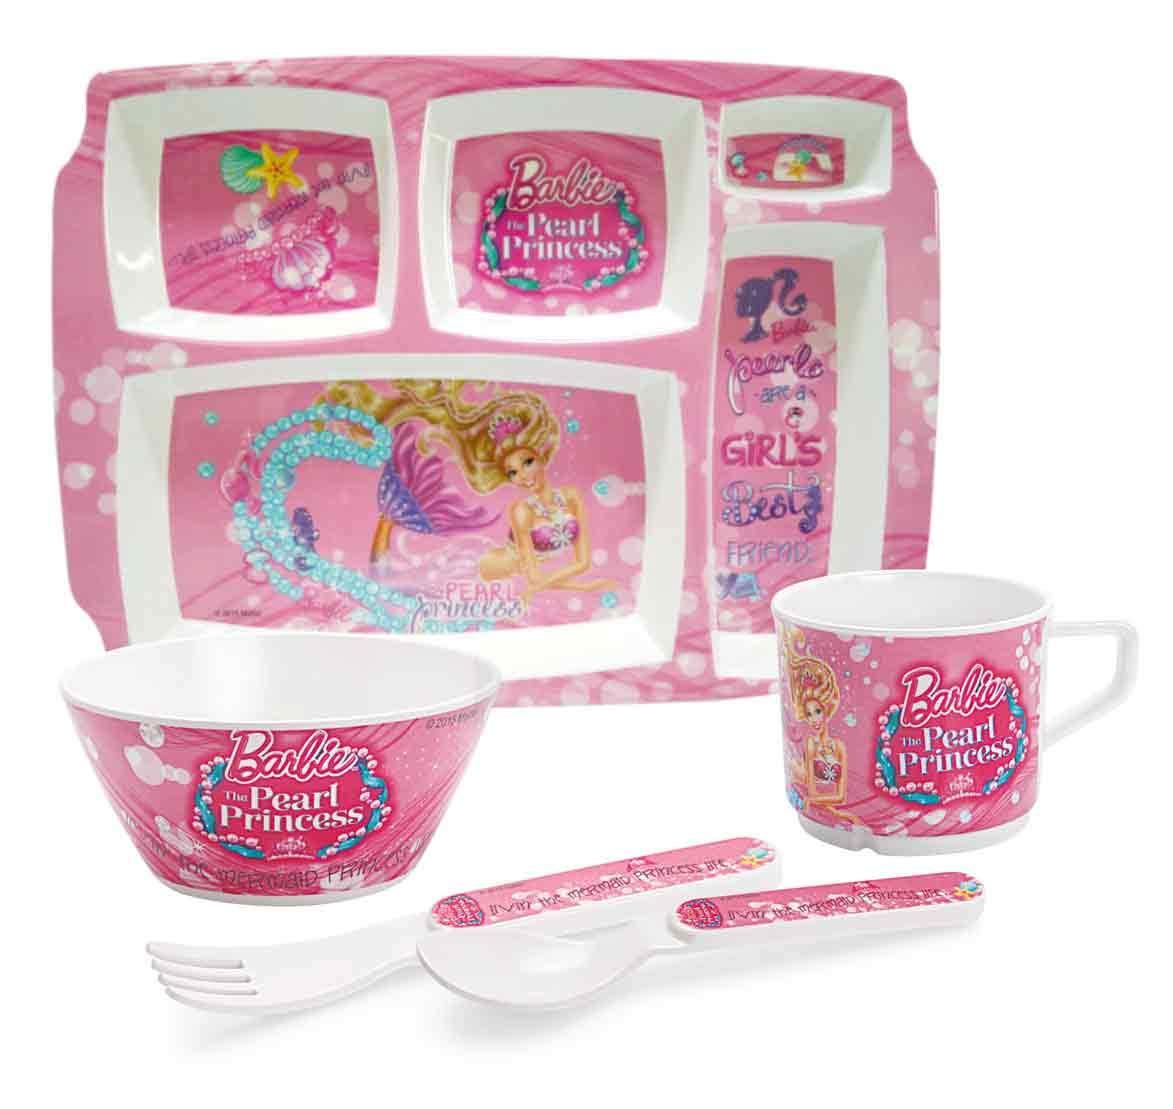 Cello Melmoware Rectangular Pearl Princess Barbie Fabulous Meal Set, Set of 5